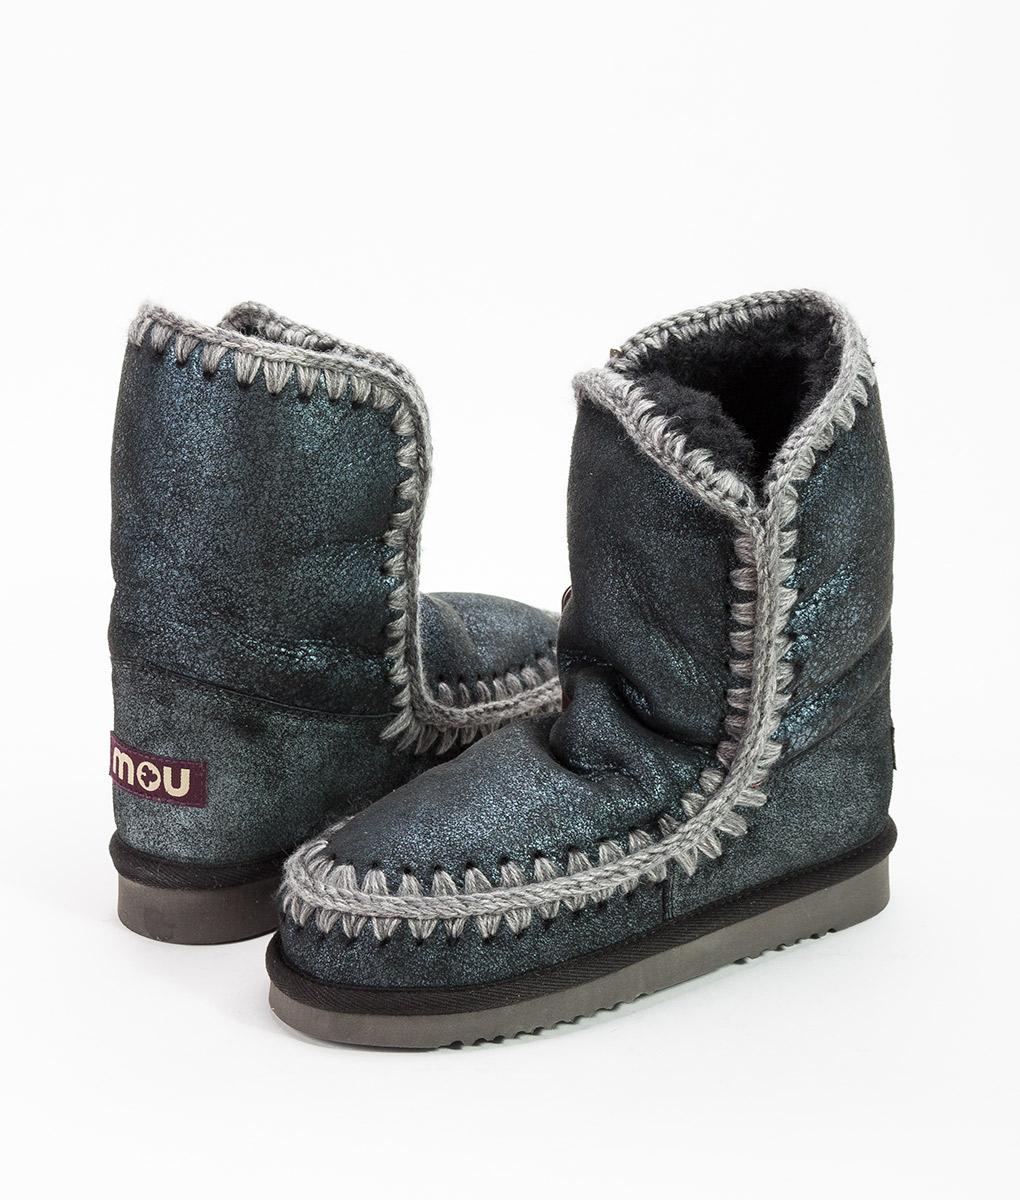 MOU Women Ankle Boots ESKIMO BOOT 24, Microglitter Blue 219.99 1